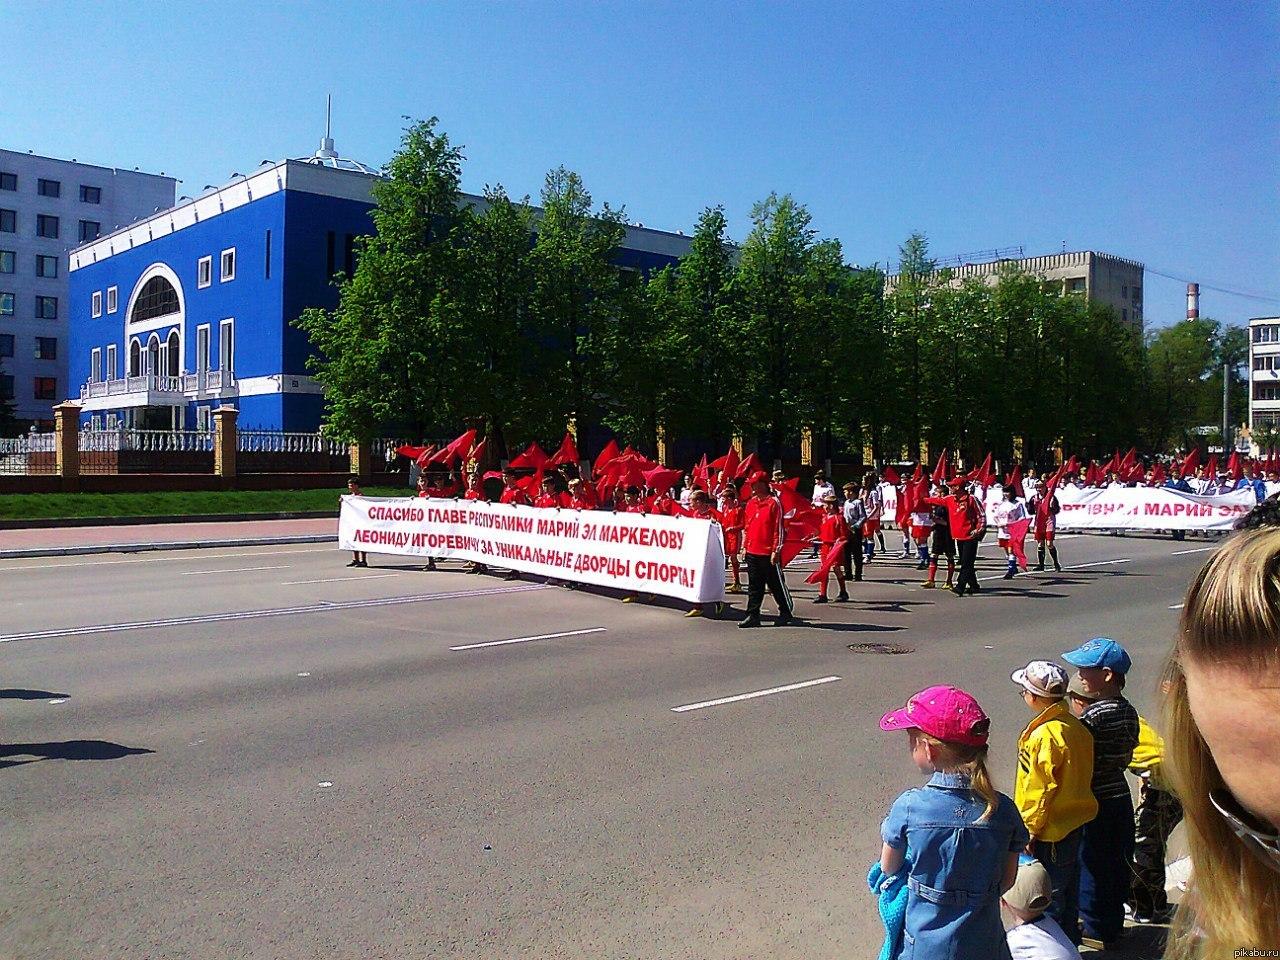 Спасибо ветеранам, ой, не так... 9 мая, парад, Йошкар-Ола,  без комментариев